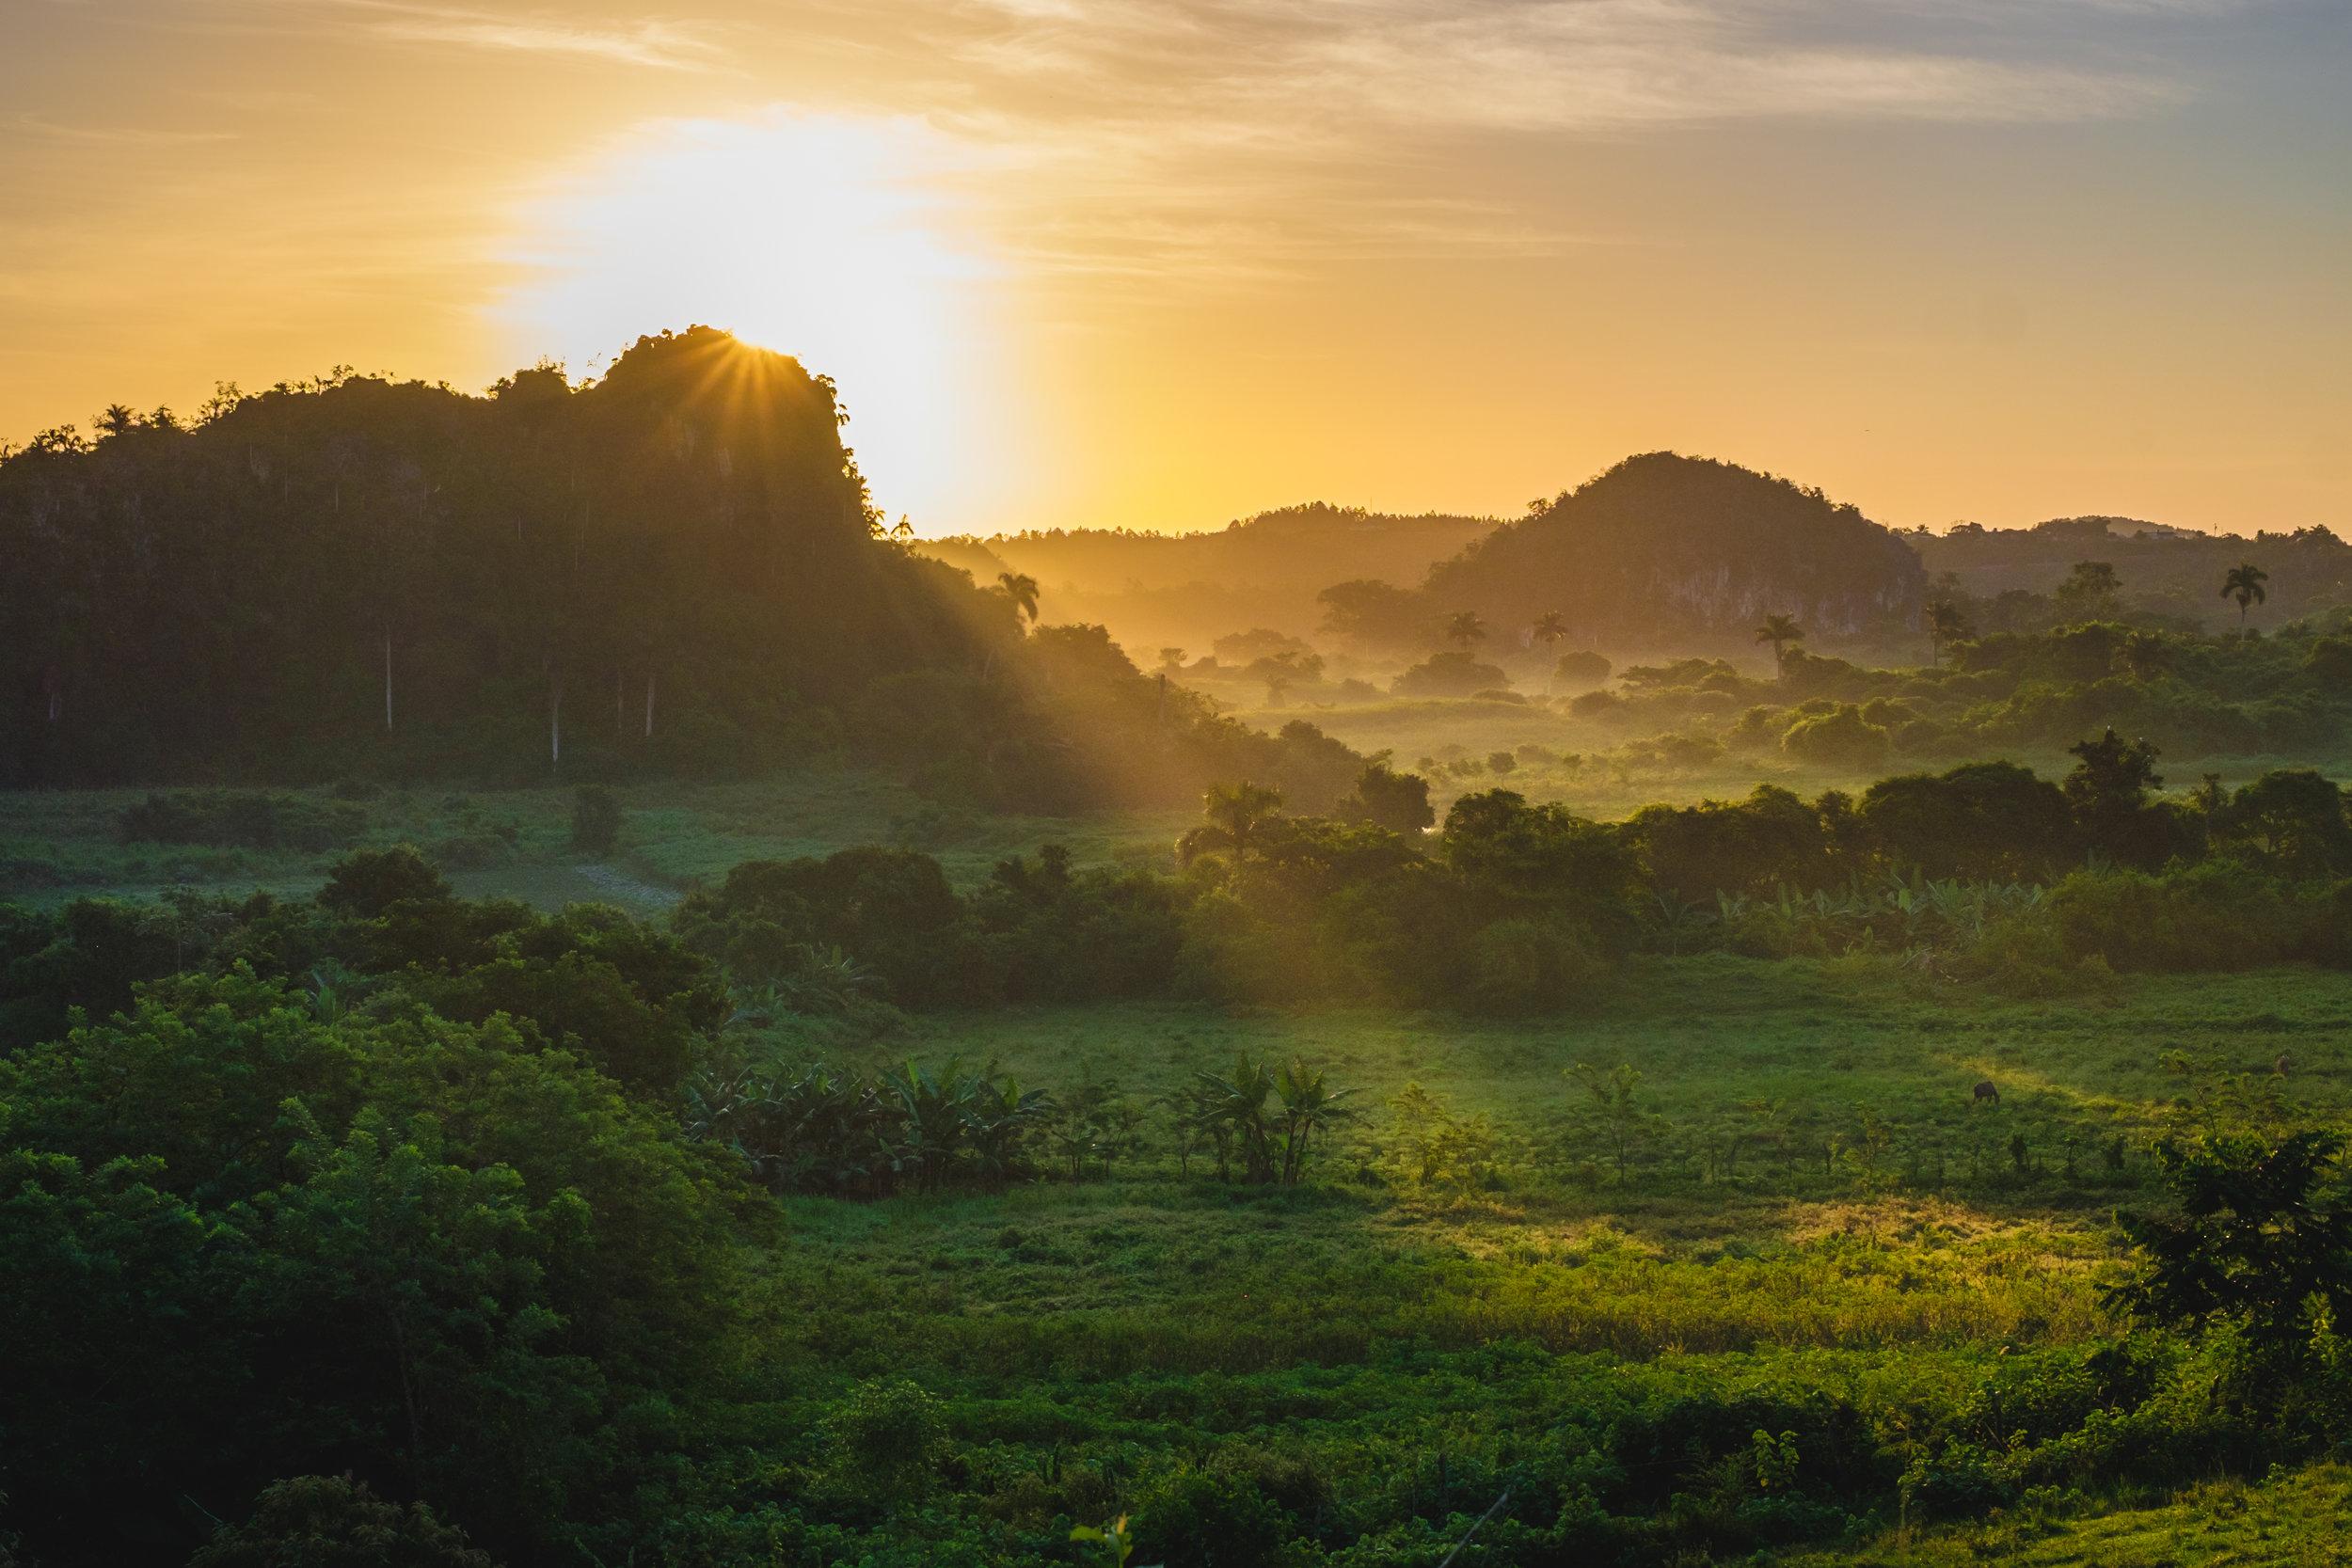 Vinales Valley, tobacco country